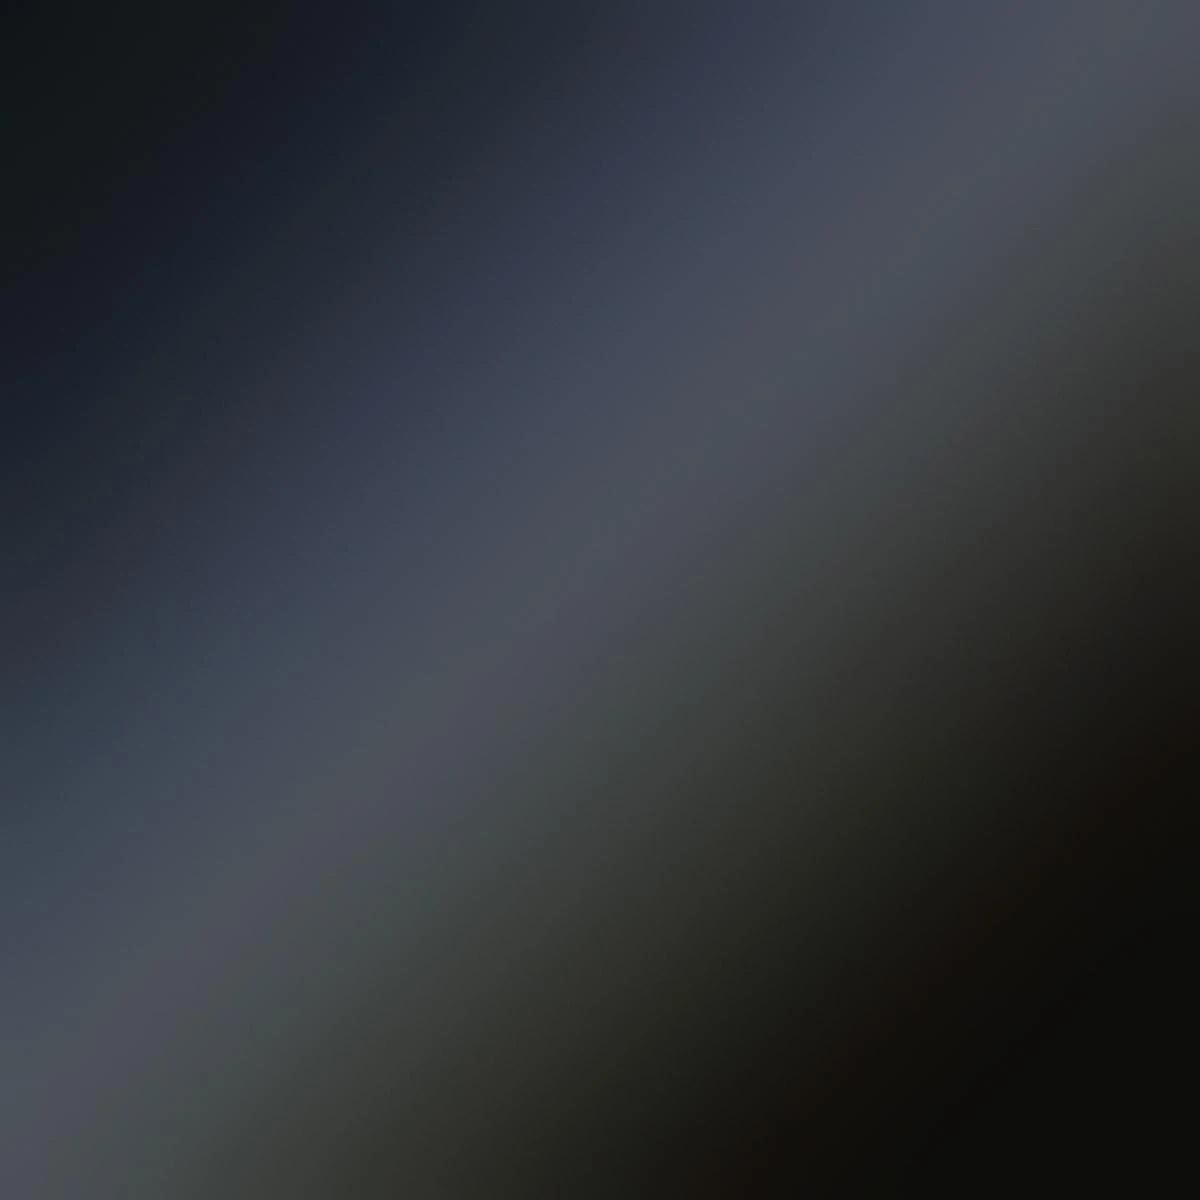 Samsung Galaxy S9 official wallpapers - يمكنك الآن تحميل الخلفيات الرسمية لجالكسي S9 وS9+ بدقتها العالية